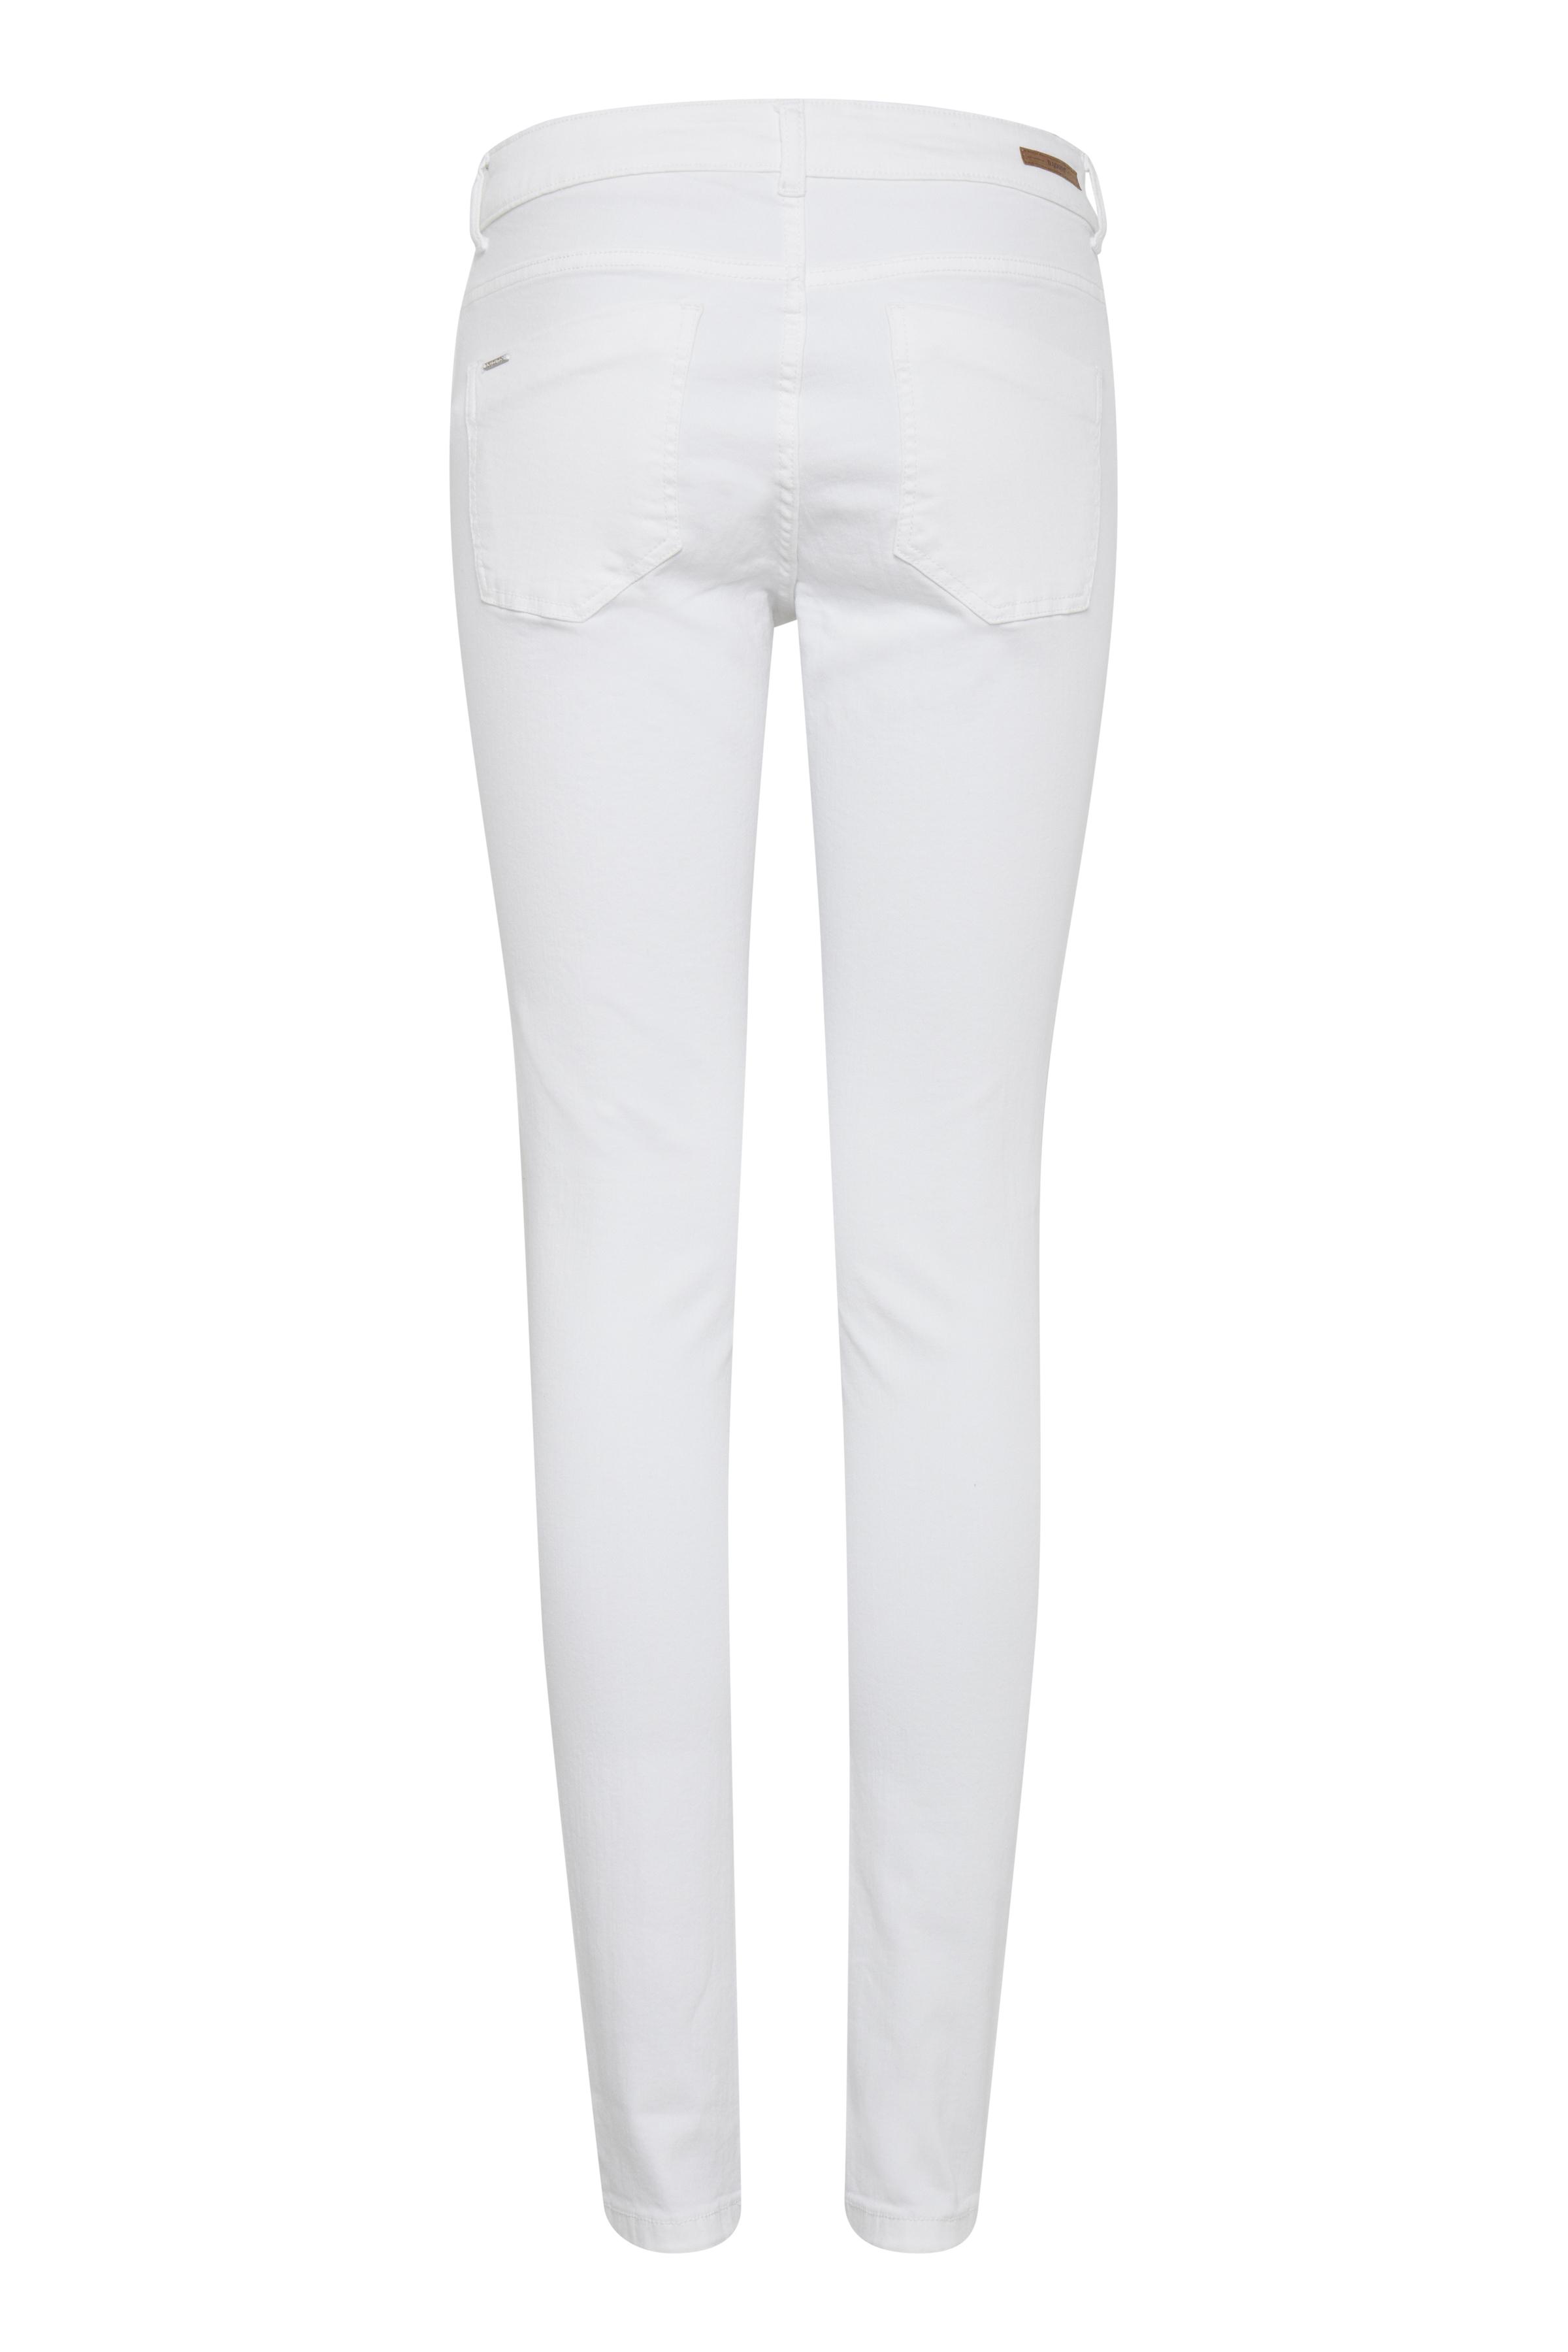 Optical White Jeans van b.young – Koop Optical White Jeans hier van size 25-36